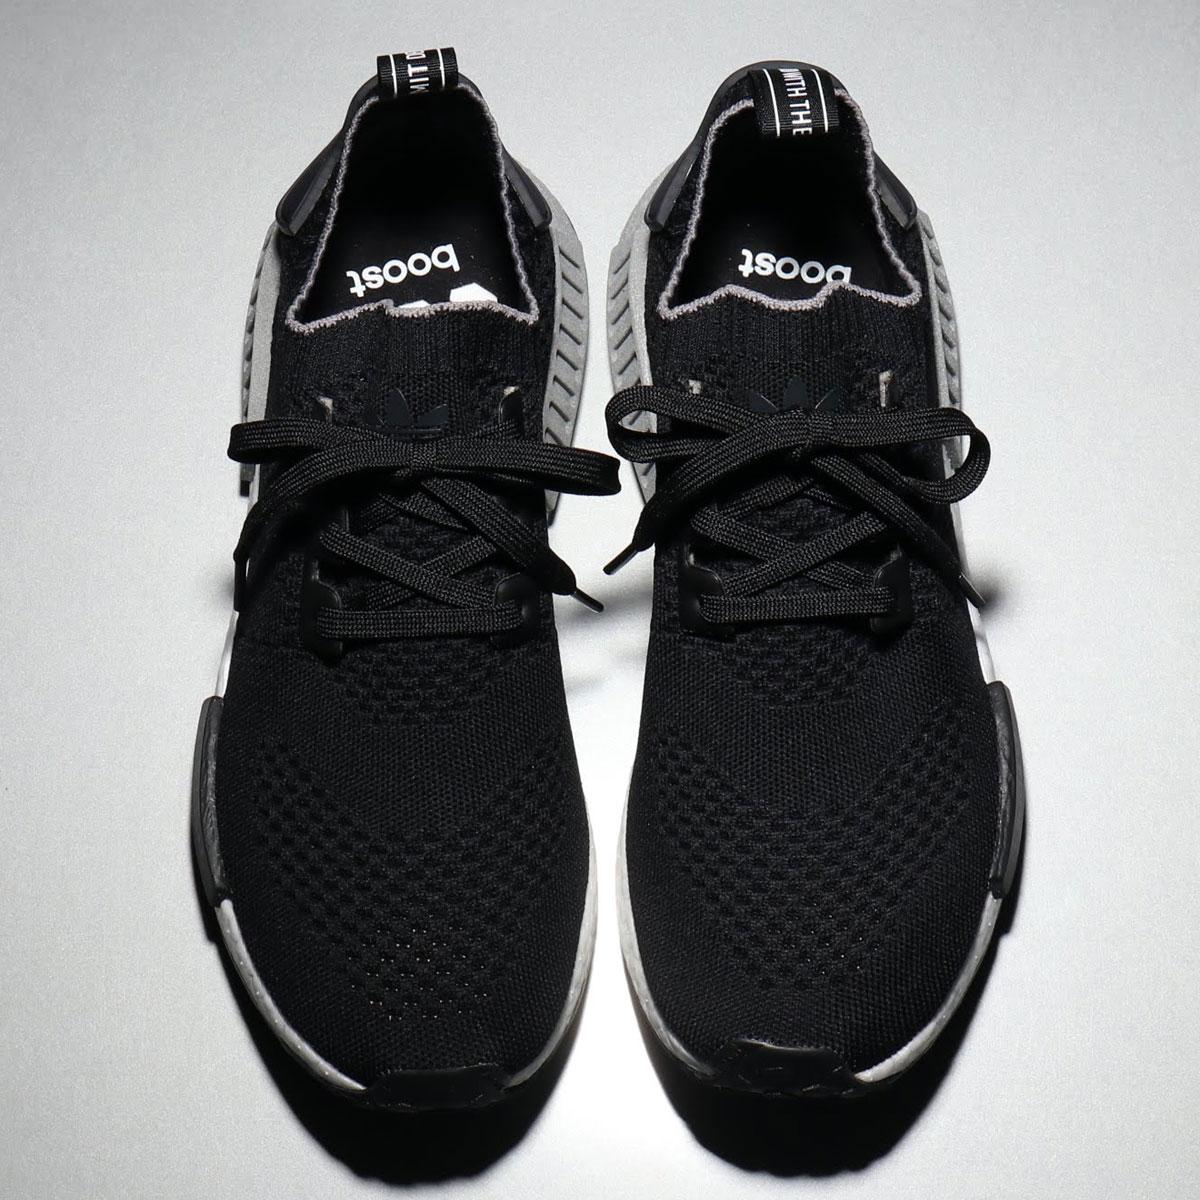 adidas NMD_R1 PK(アディダス エヌエムディー_R1 PK)CORE BLACK/CORE BLACK/GREY THREE【メンズ レディース スニーカー】19FW-I